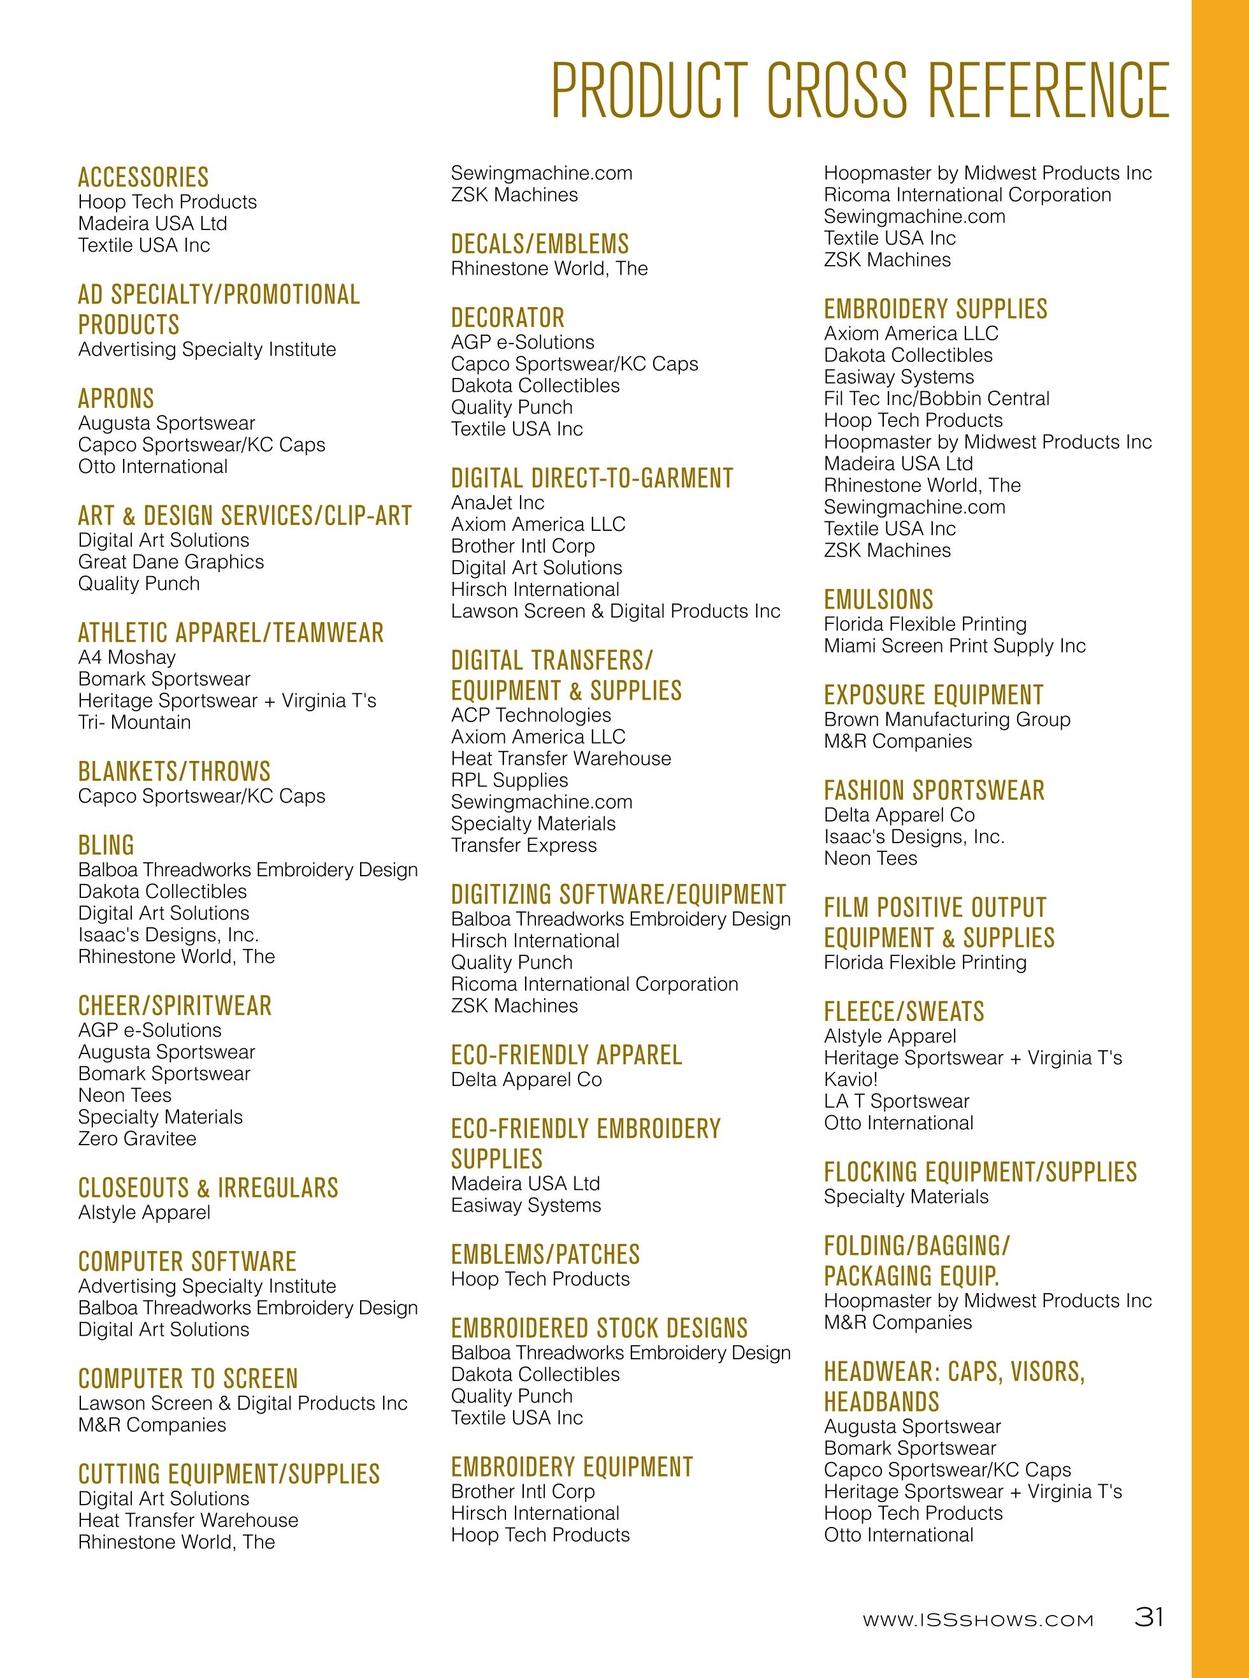 ISS Orlando 2014 Show Directory